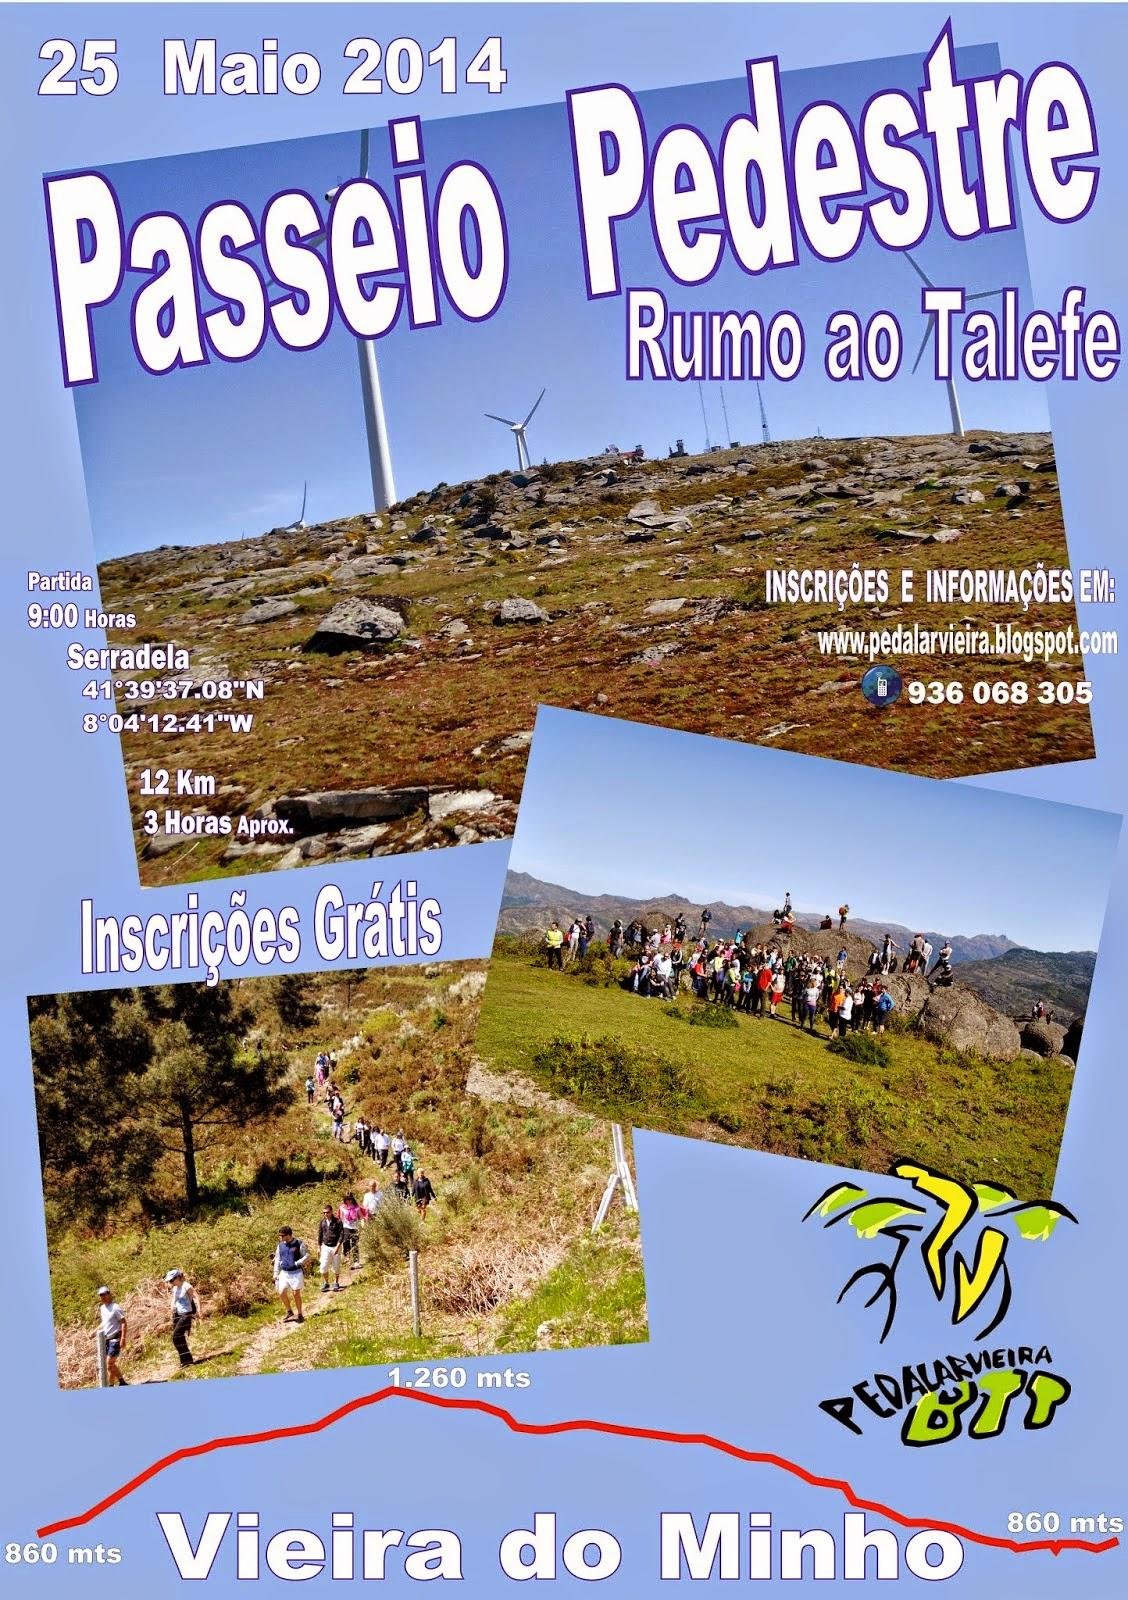 PASSEIO PEDESTRE RUMO AO TALEFE